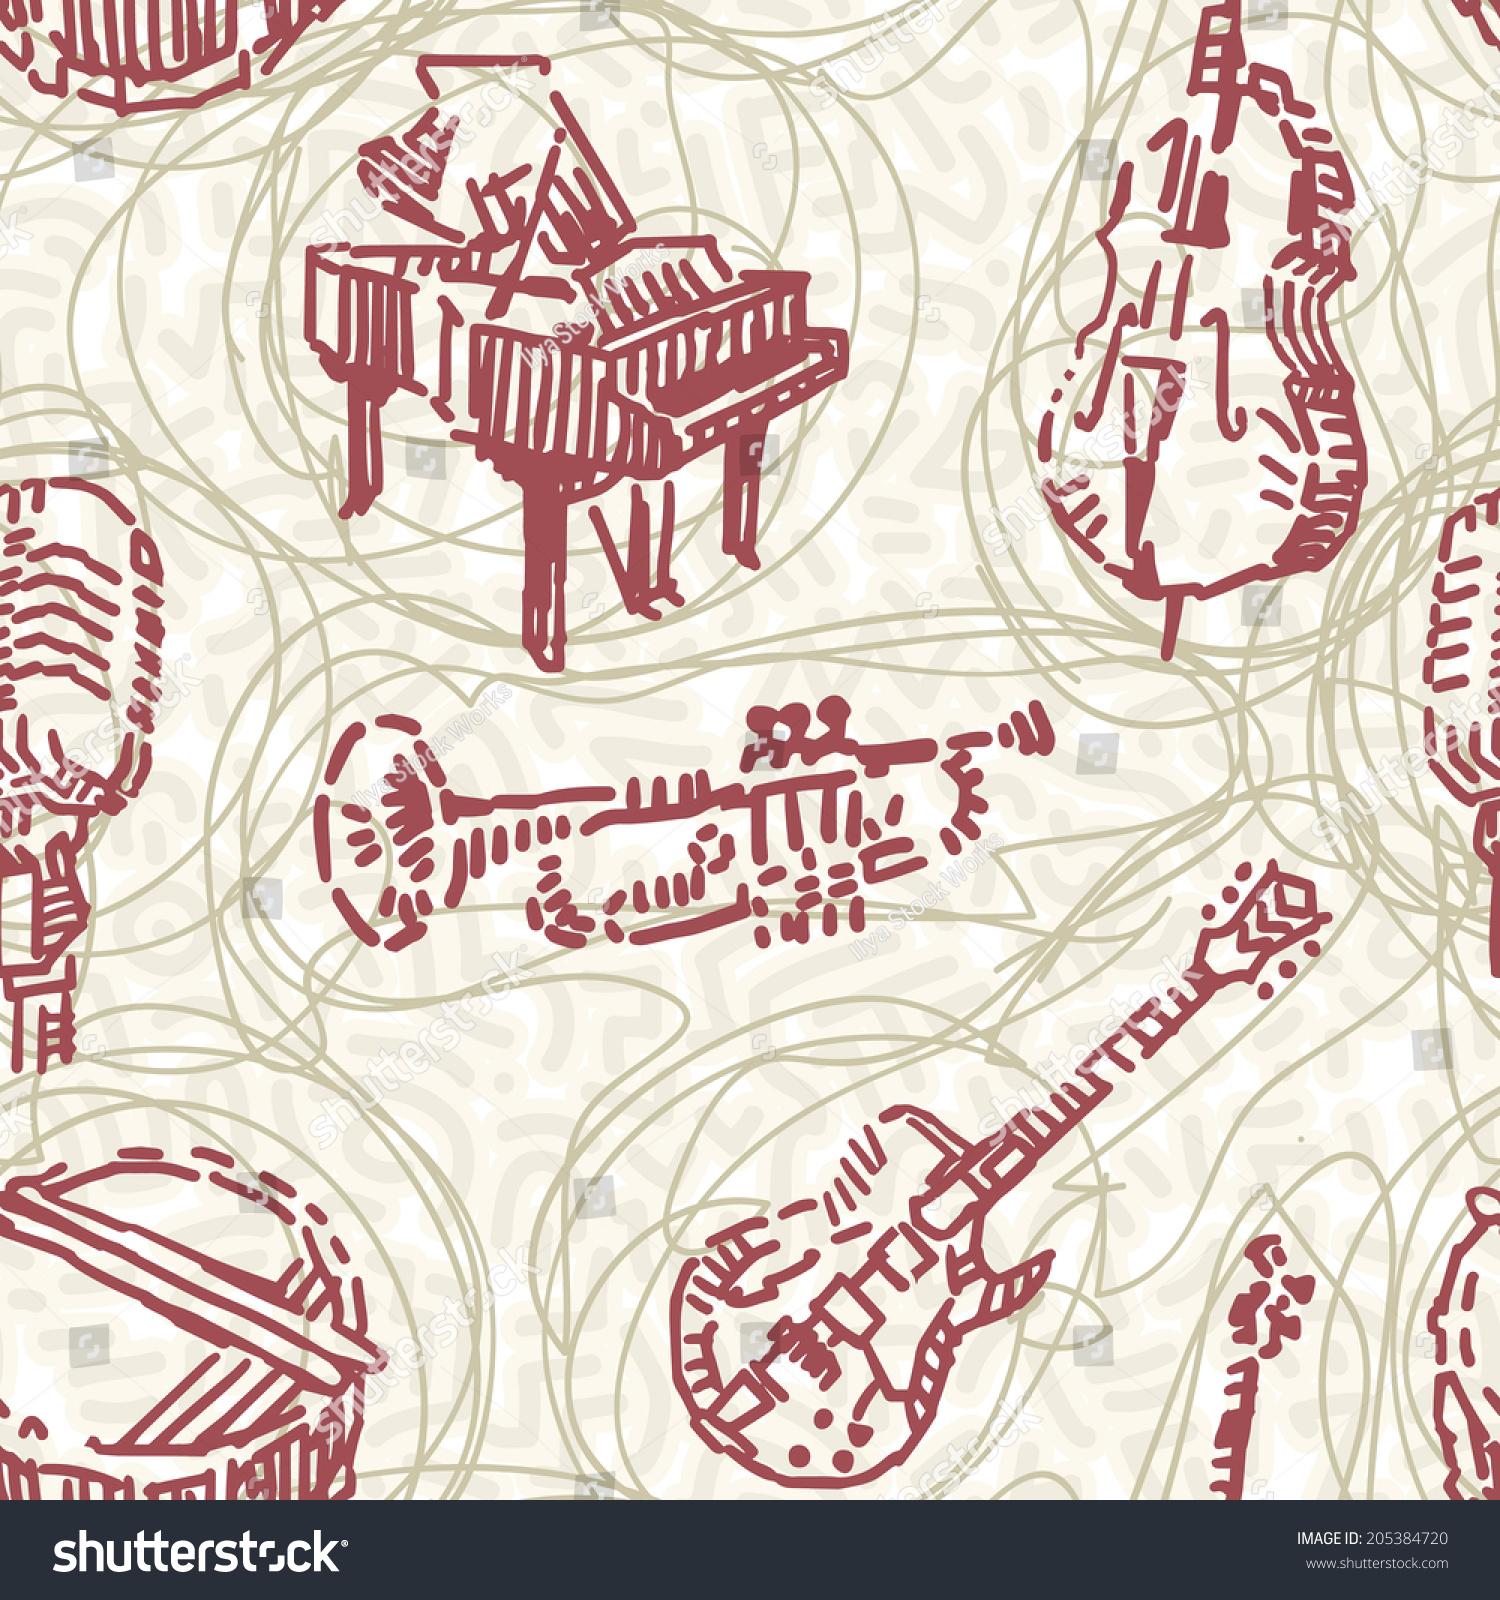 Music instruments seamless pattern